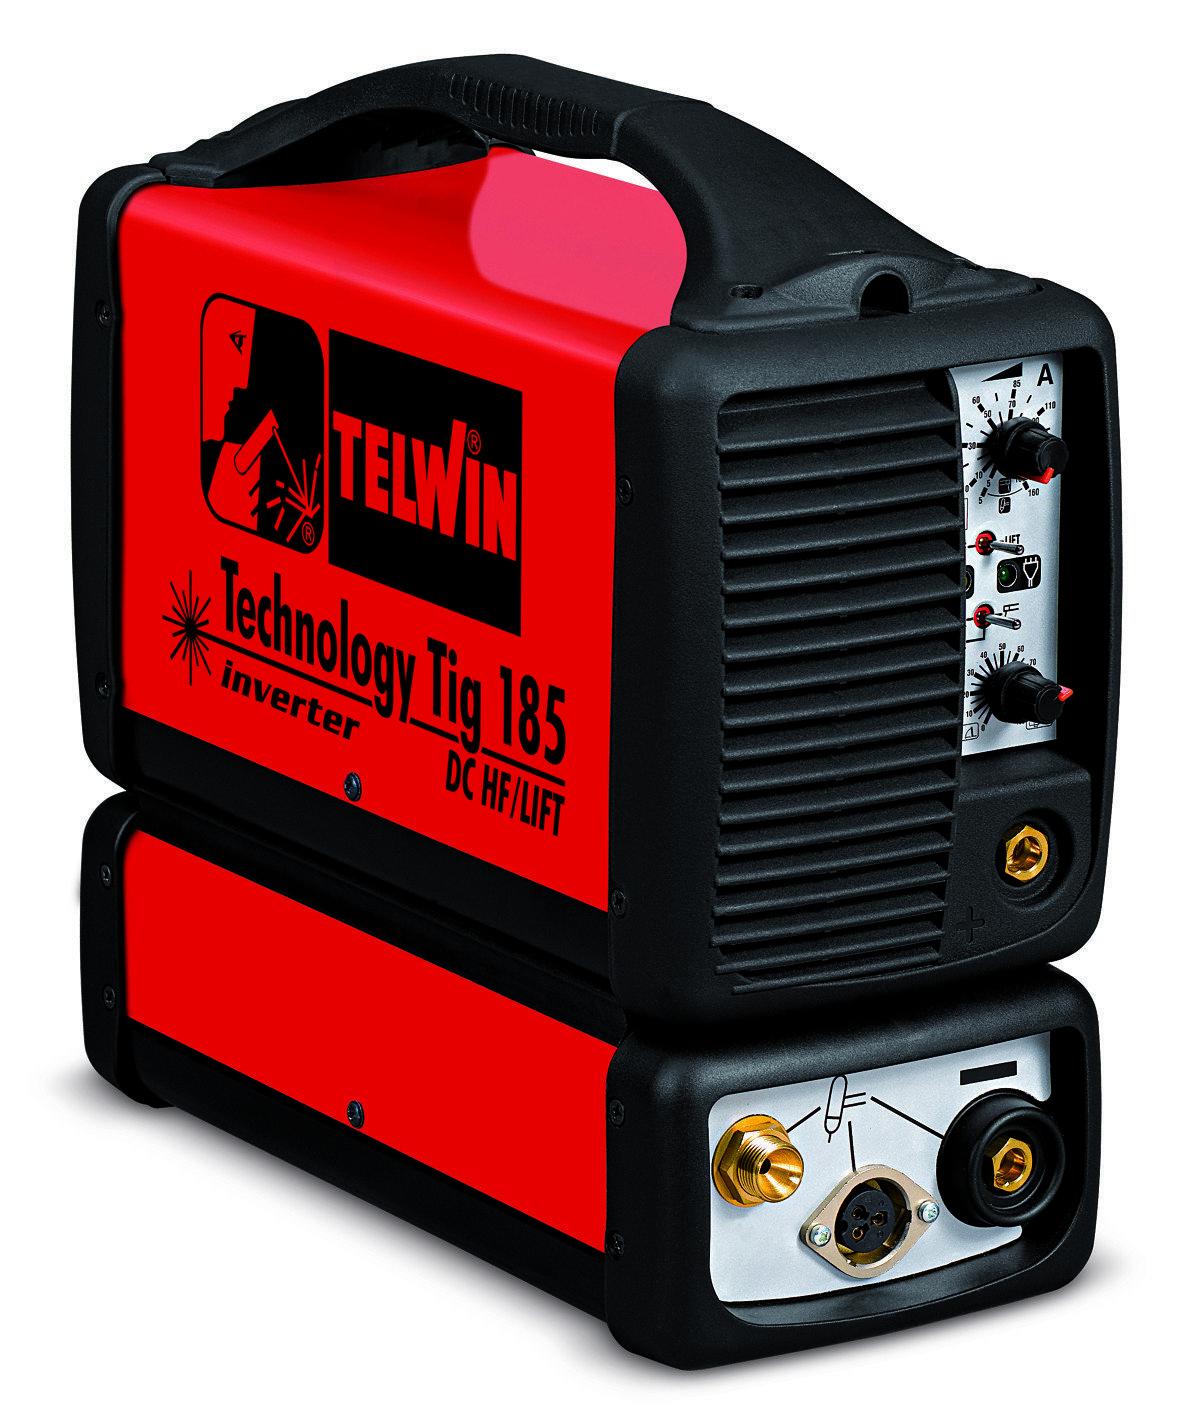 Аппарат аргонодуговой сварки Telwin TECHNOLOGY TIG 185 DC + ALU CASE + TIG ACC. 815956